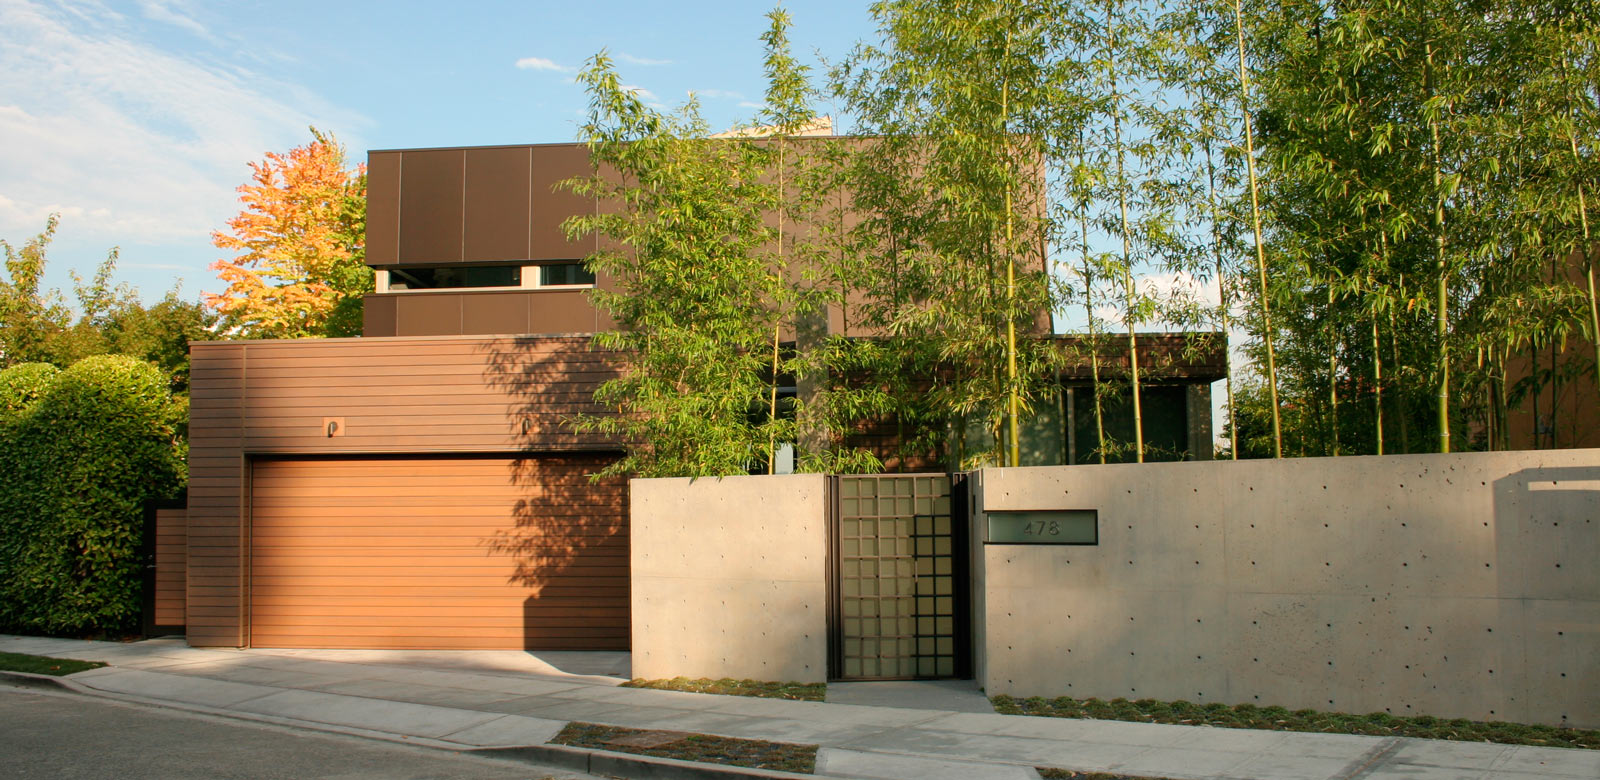 39th Street Residence designed by Stuart Silk